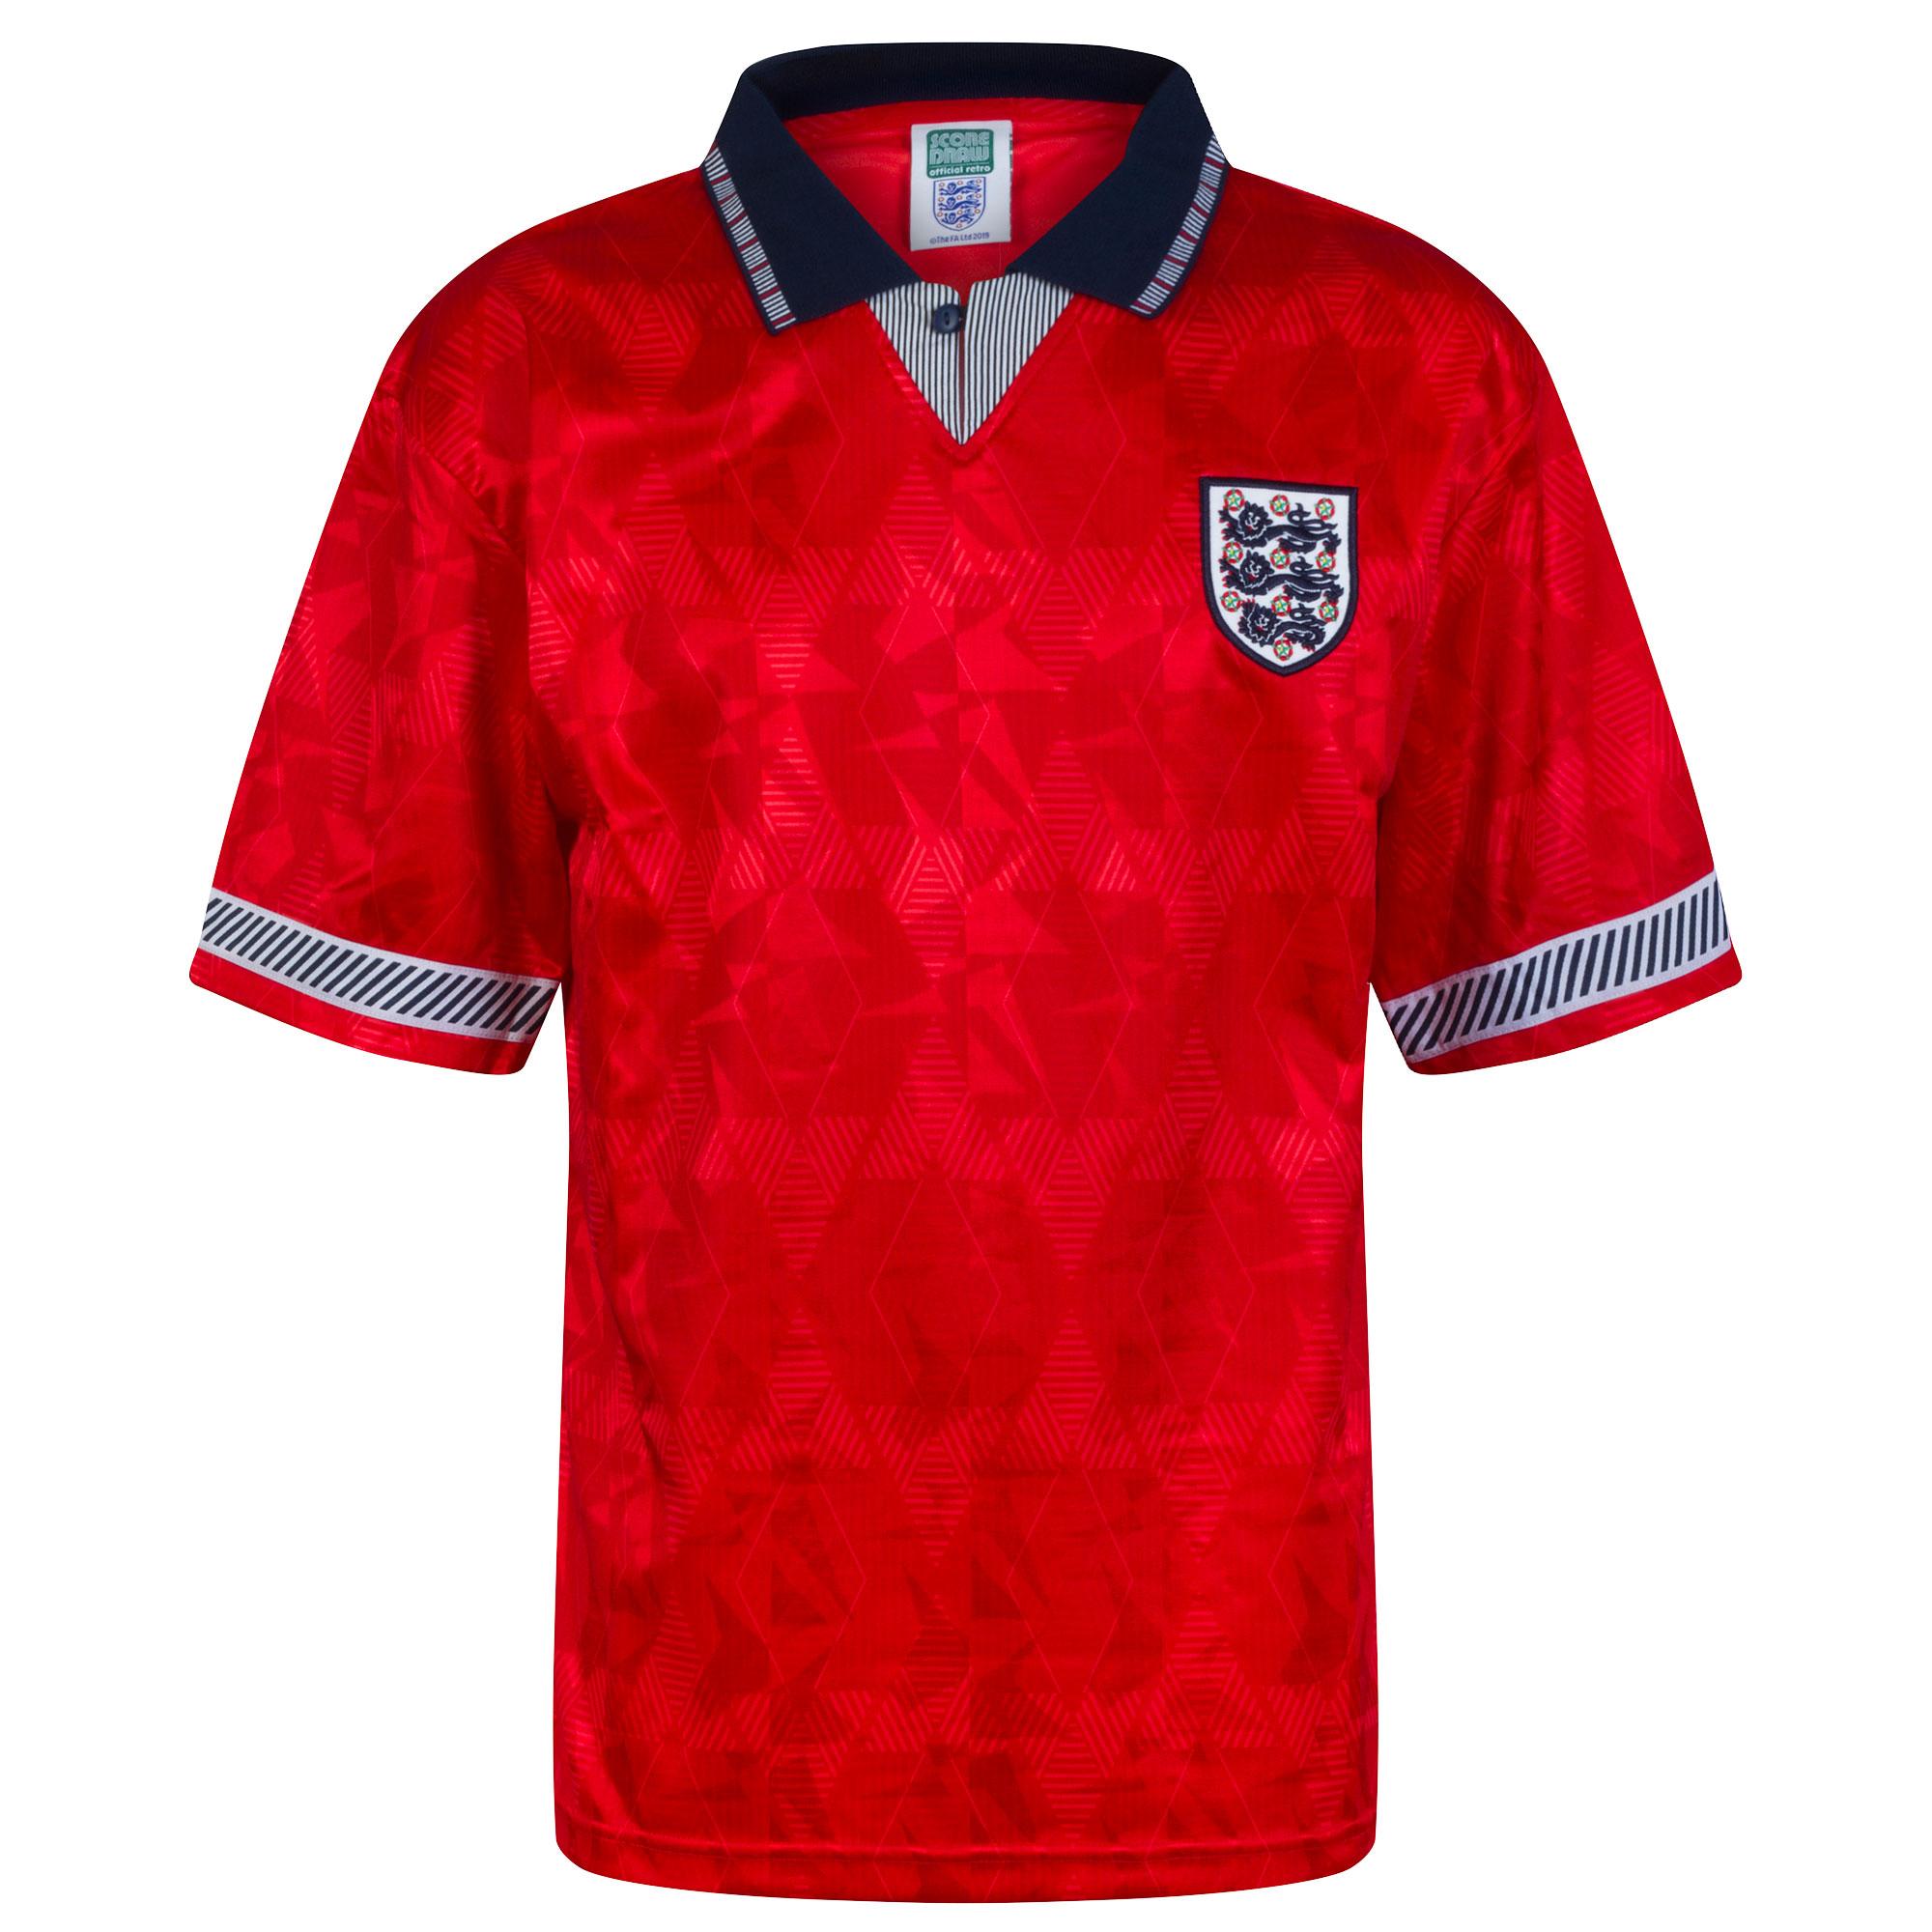 Score Draw England Away Retro Shirt World Cup 1990